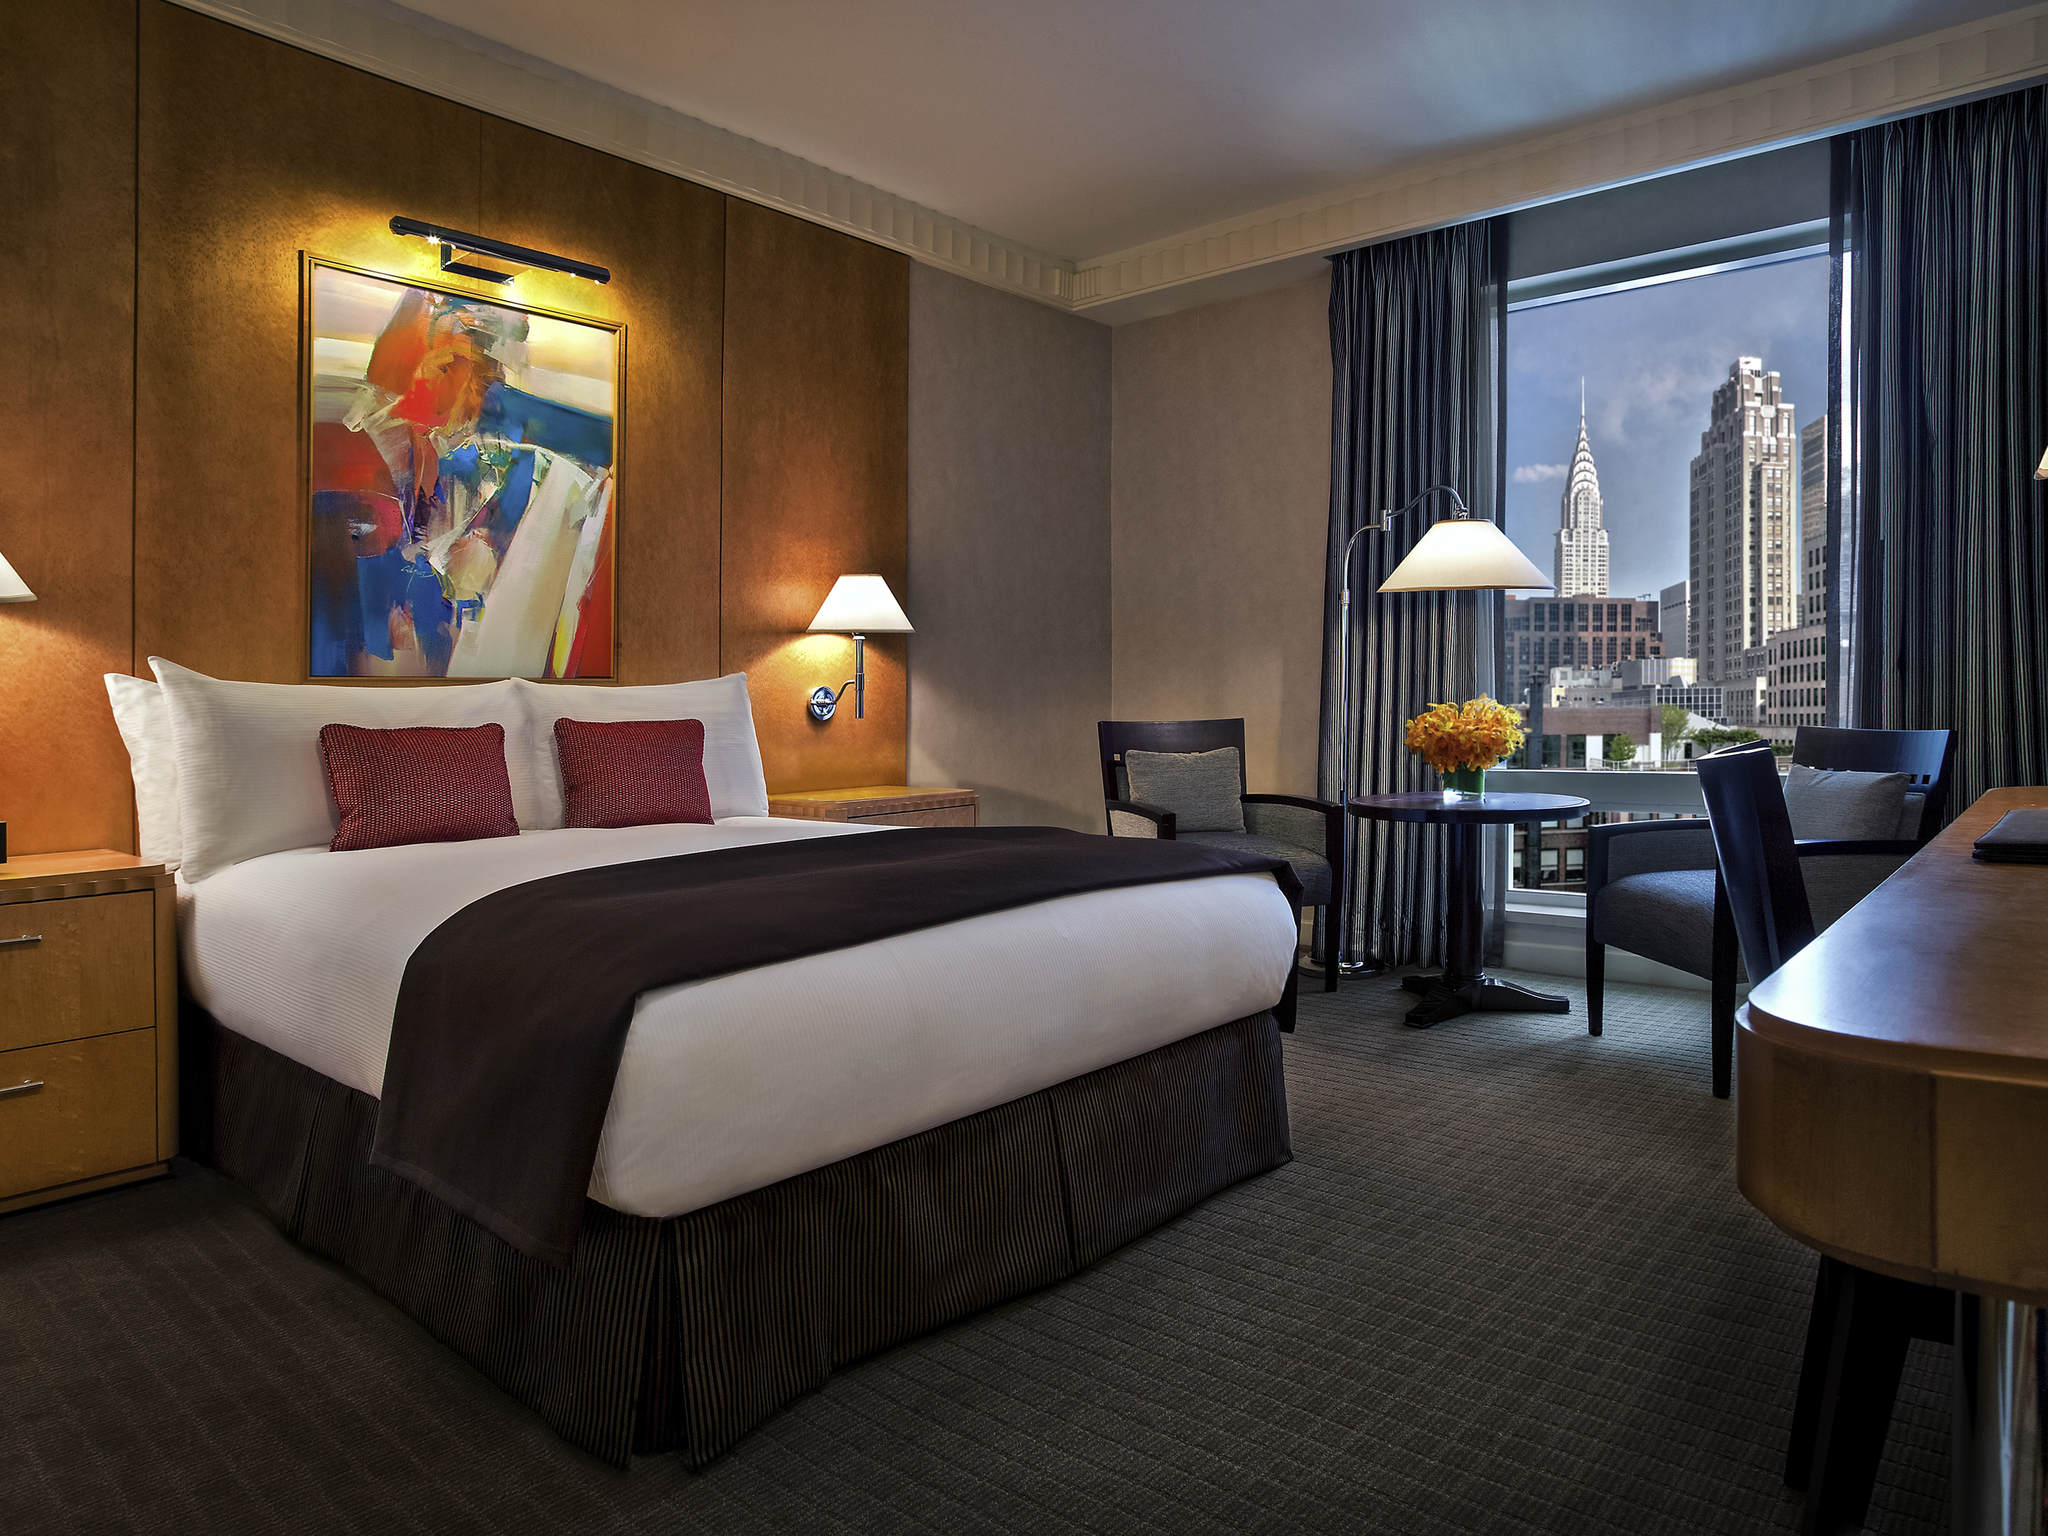 Hotel In NEW YORK CITY Sofitel New York - Hotel avec cuisine new york